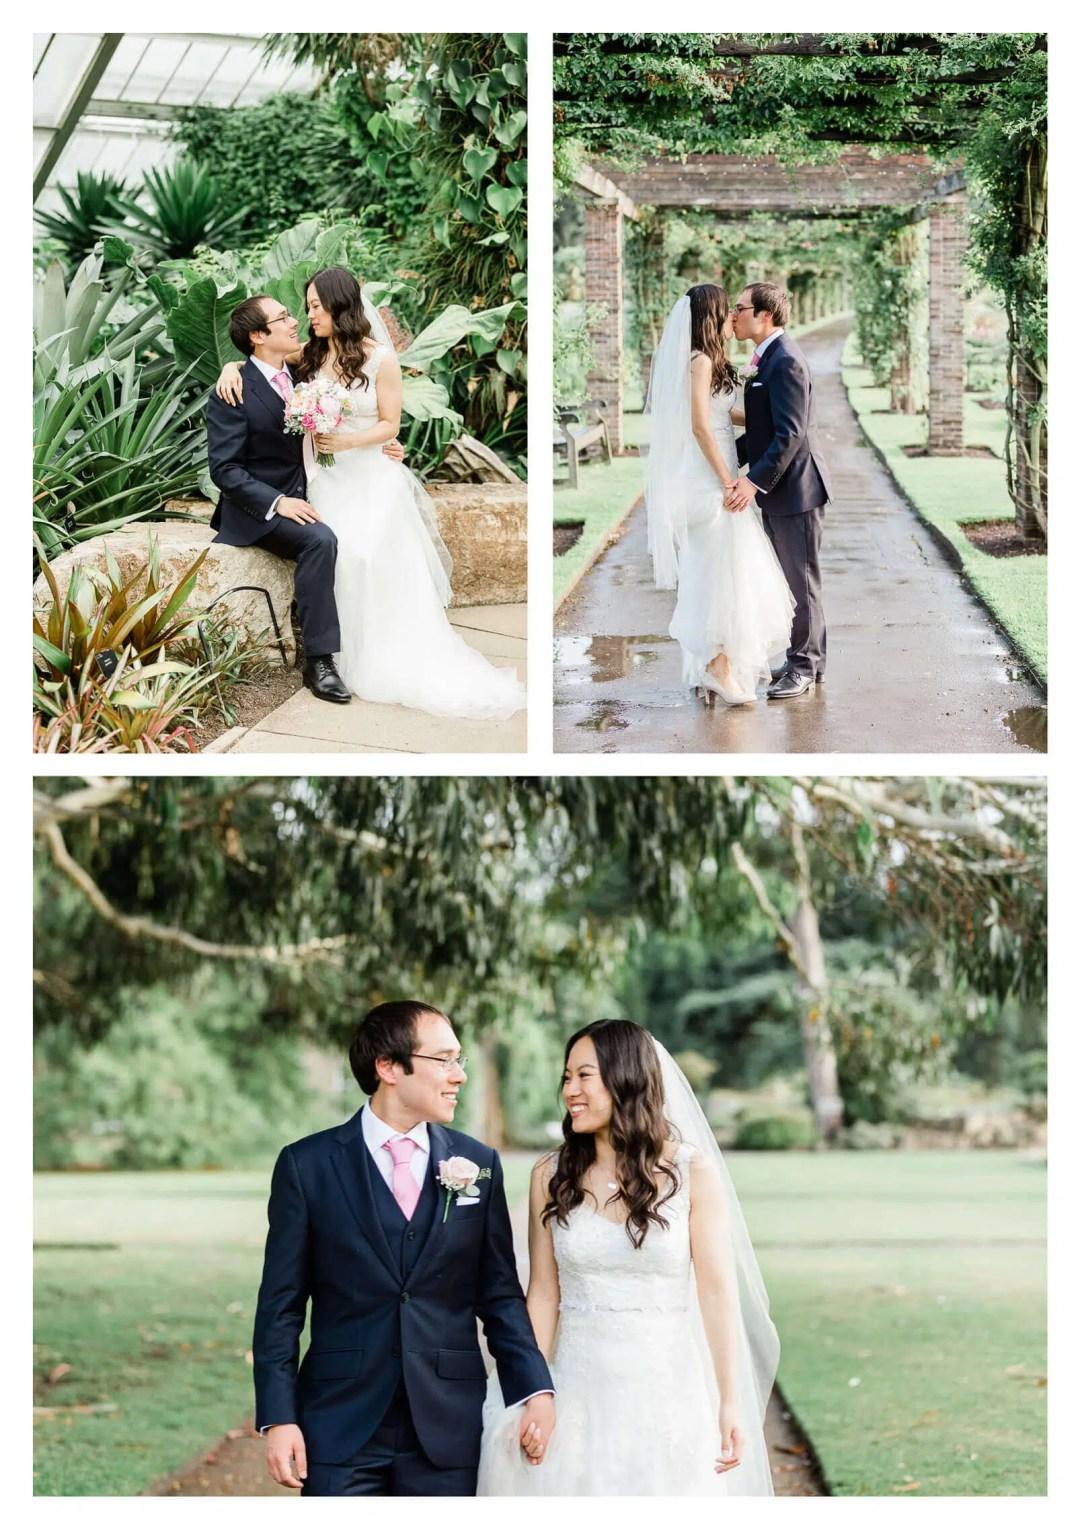 Kew Gardens wedding couple portraits | London photographer